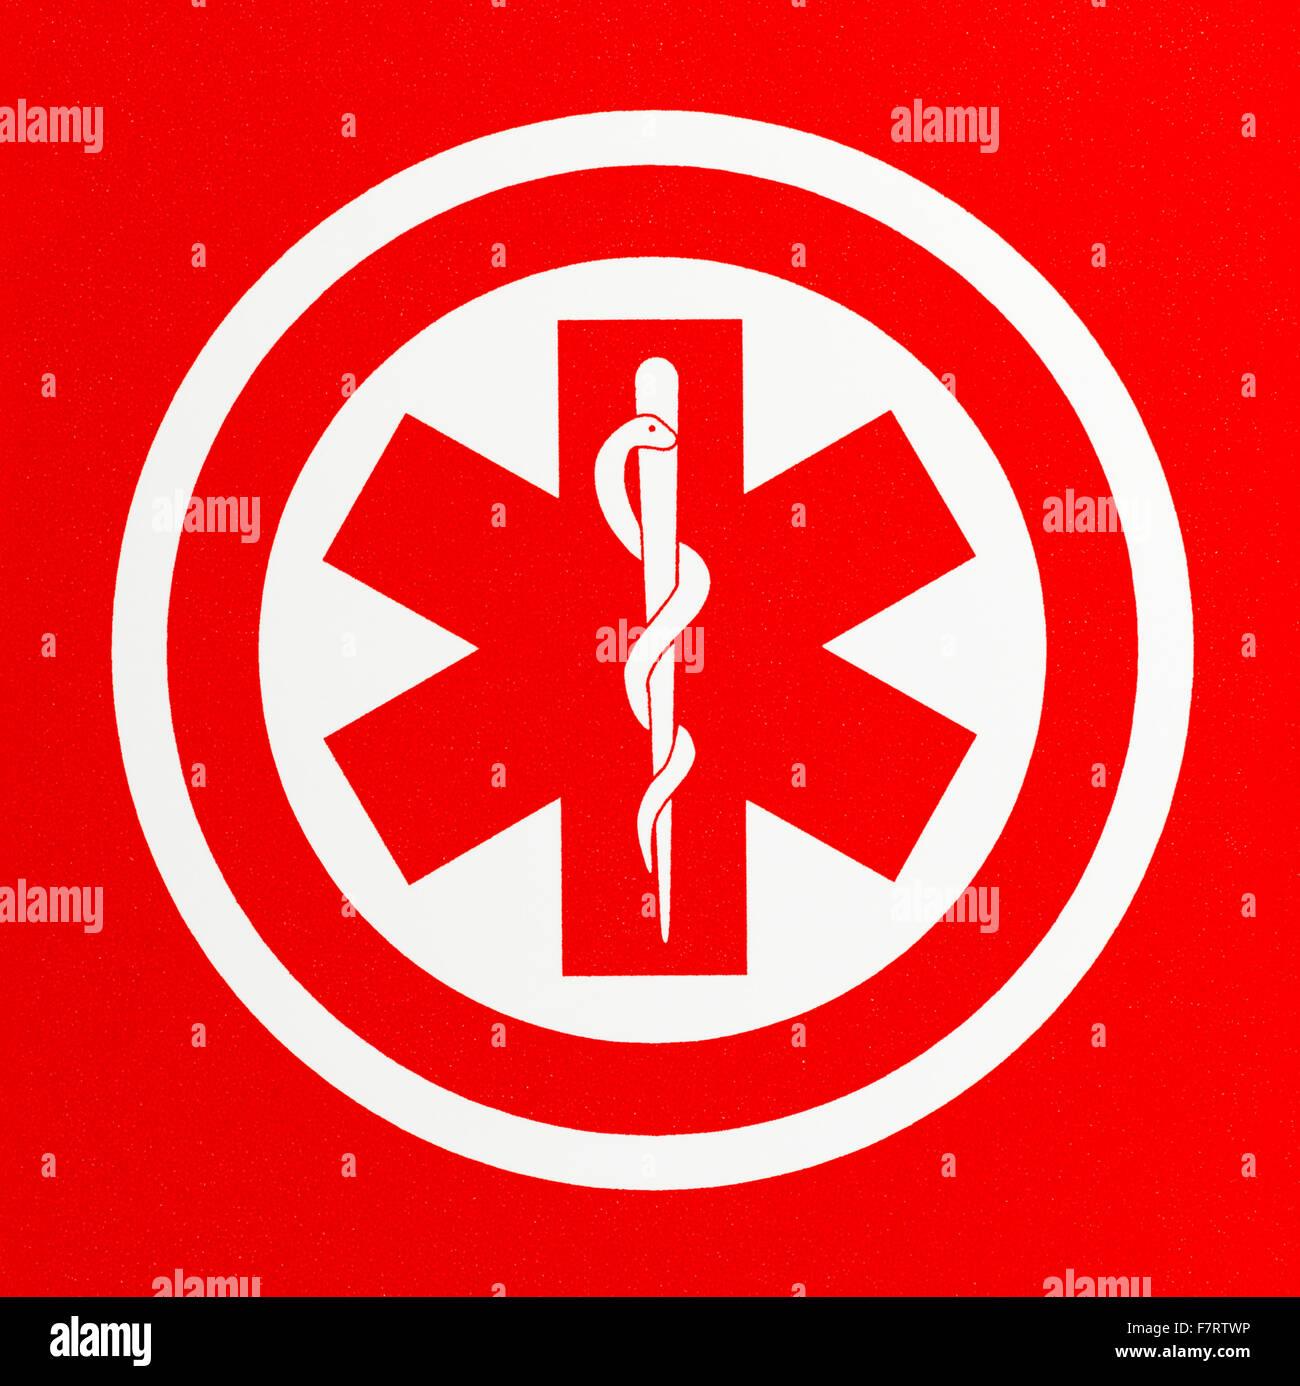 Red Health Care Caduceus Symbol in Circle. - Stock Image